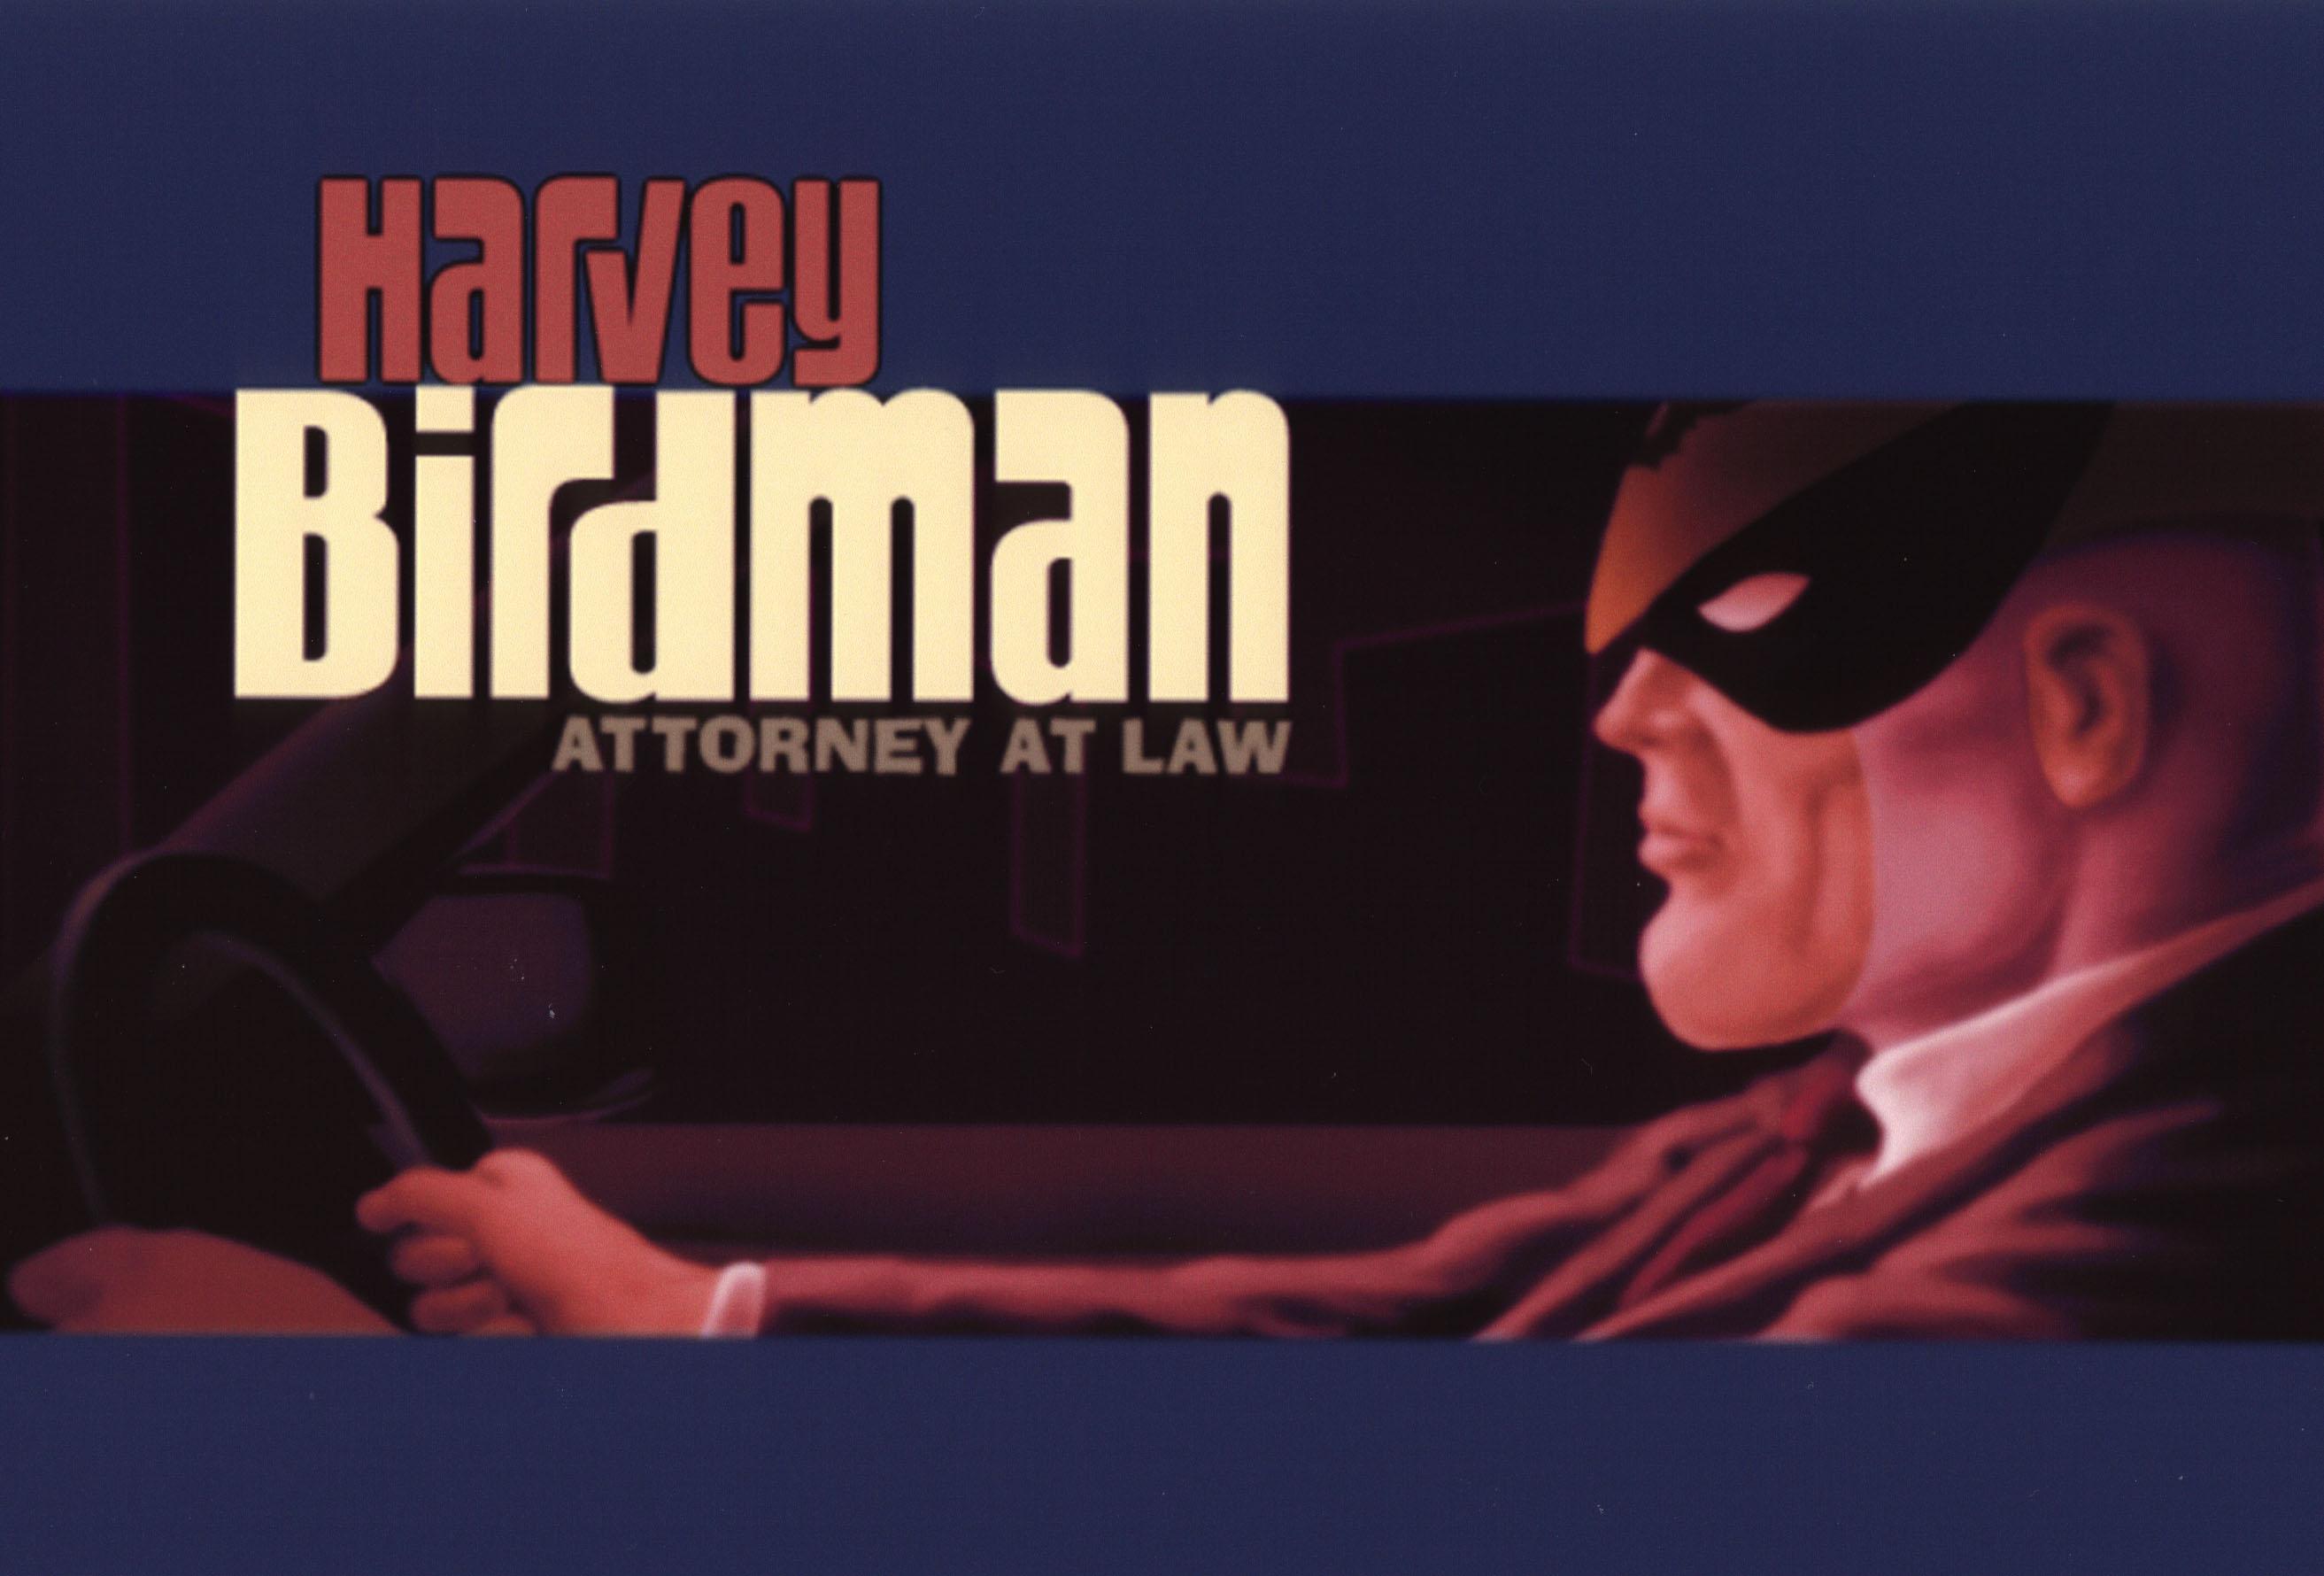 Harvey Birdman; Attorney at Law icon